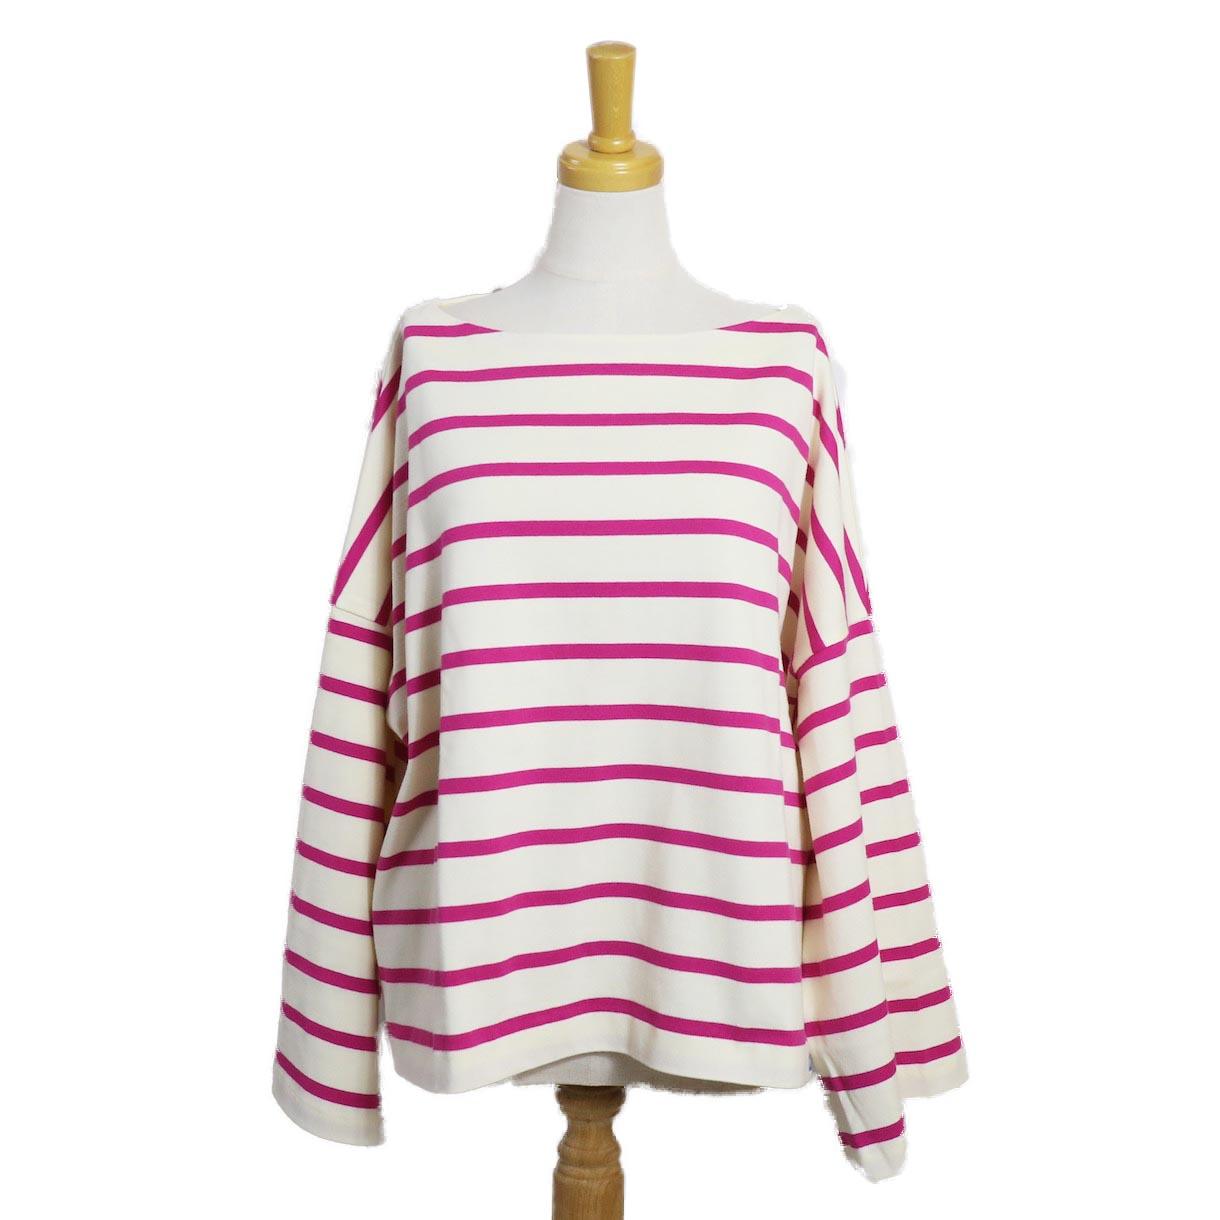 BLUEBIRD BOULEVARD / ボーダーバスクシャツ(長袖)PINK